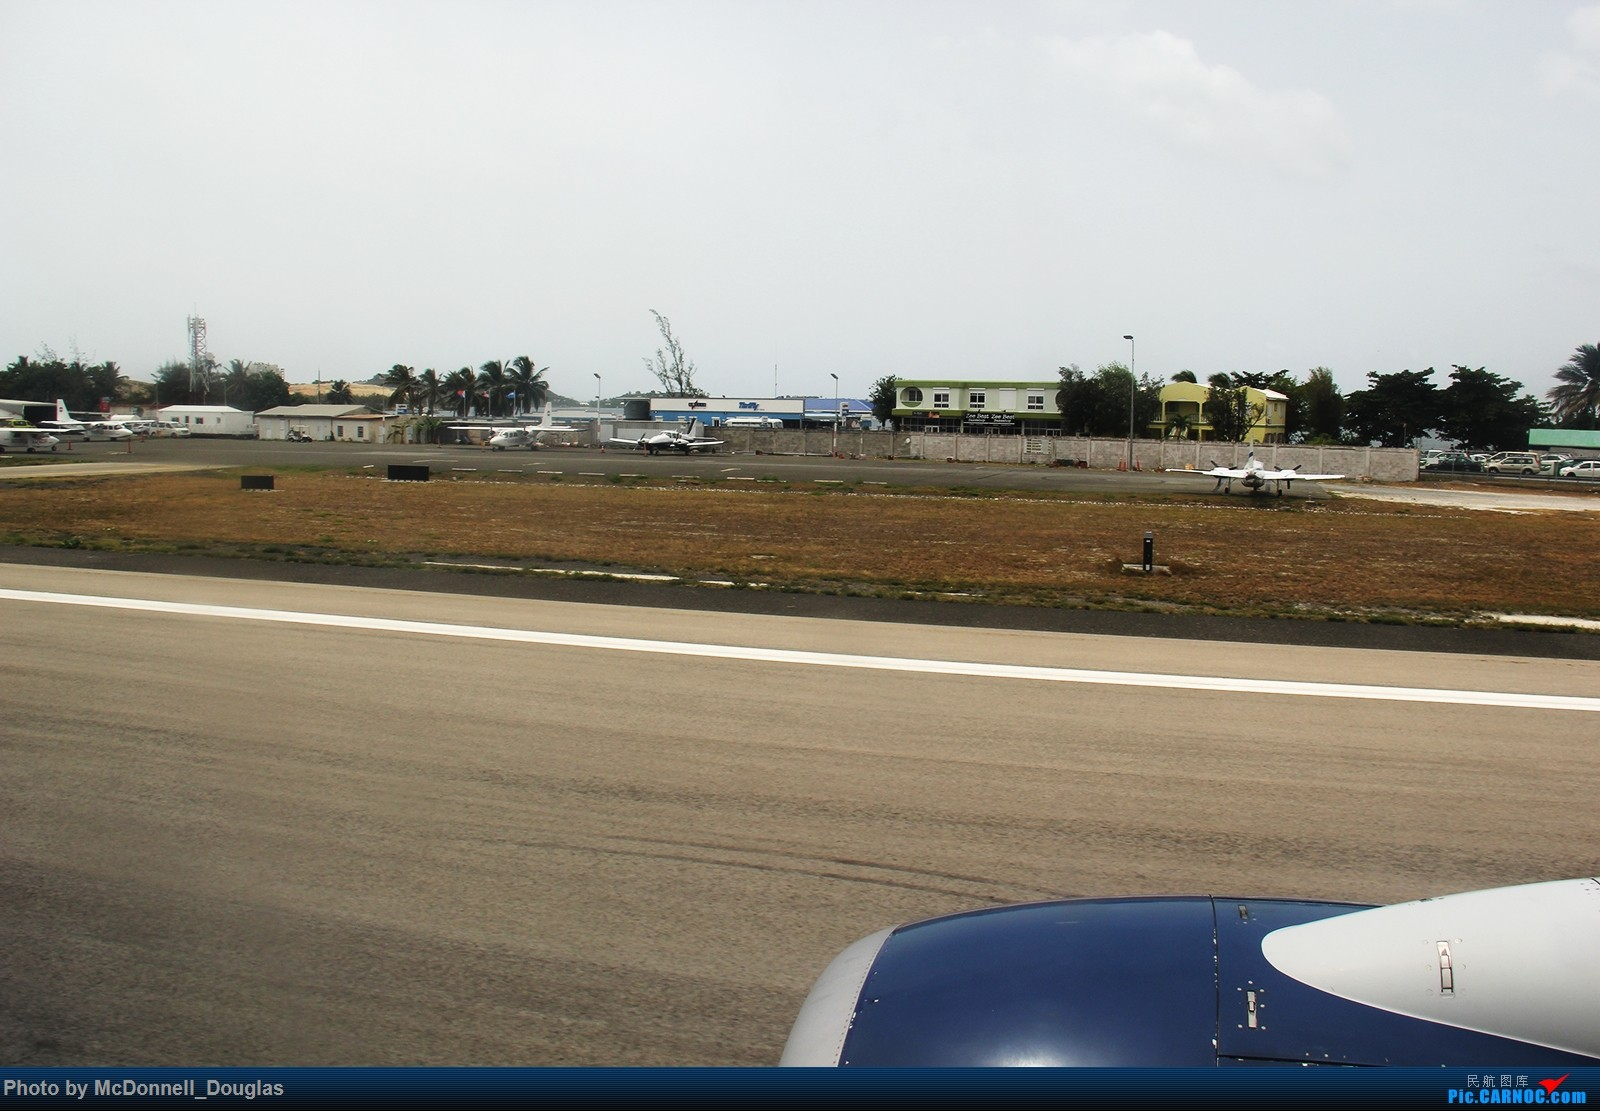 Re:[原创]【上海飞友会】图会很多,也有很多驾驶舱,杂七杂八的美帝,梦寐以求的圣马丁,这更绝不弃贴【驾驶舱已出现】【已更新至圣马丁部分】 BOEING737-732 N301DQ 荷属安的列斯群岛朱利安娜公主机场